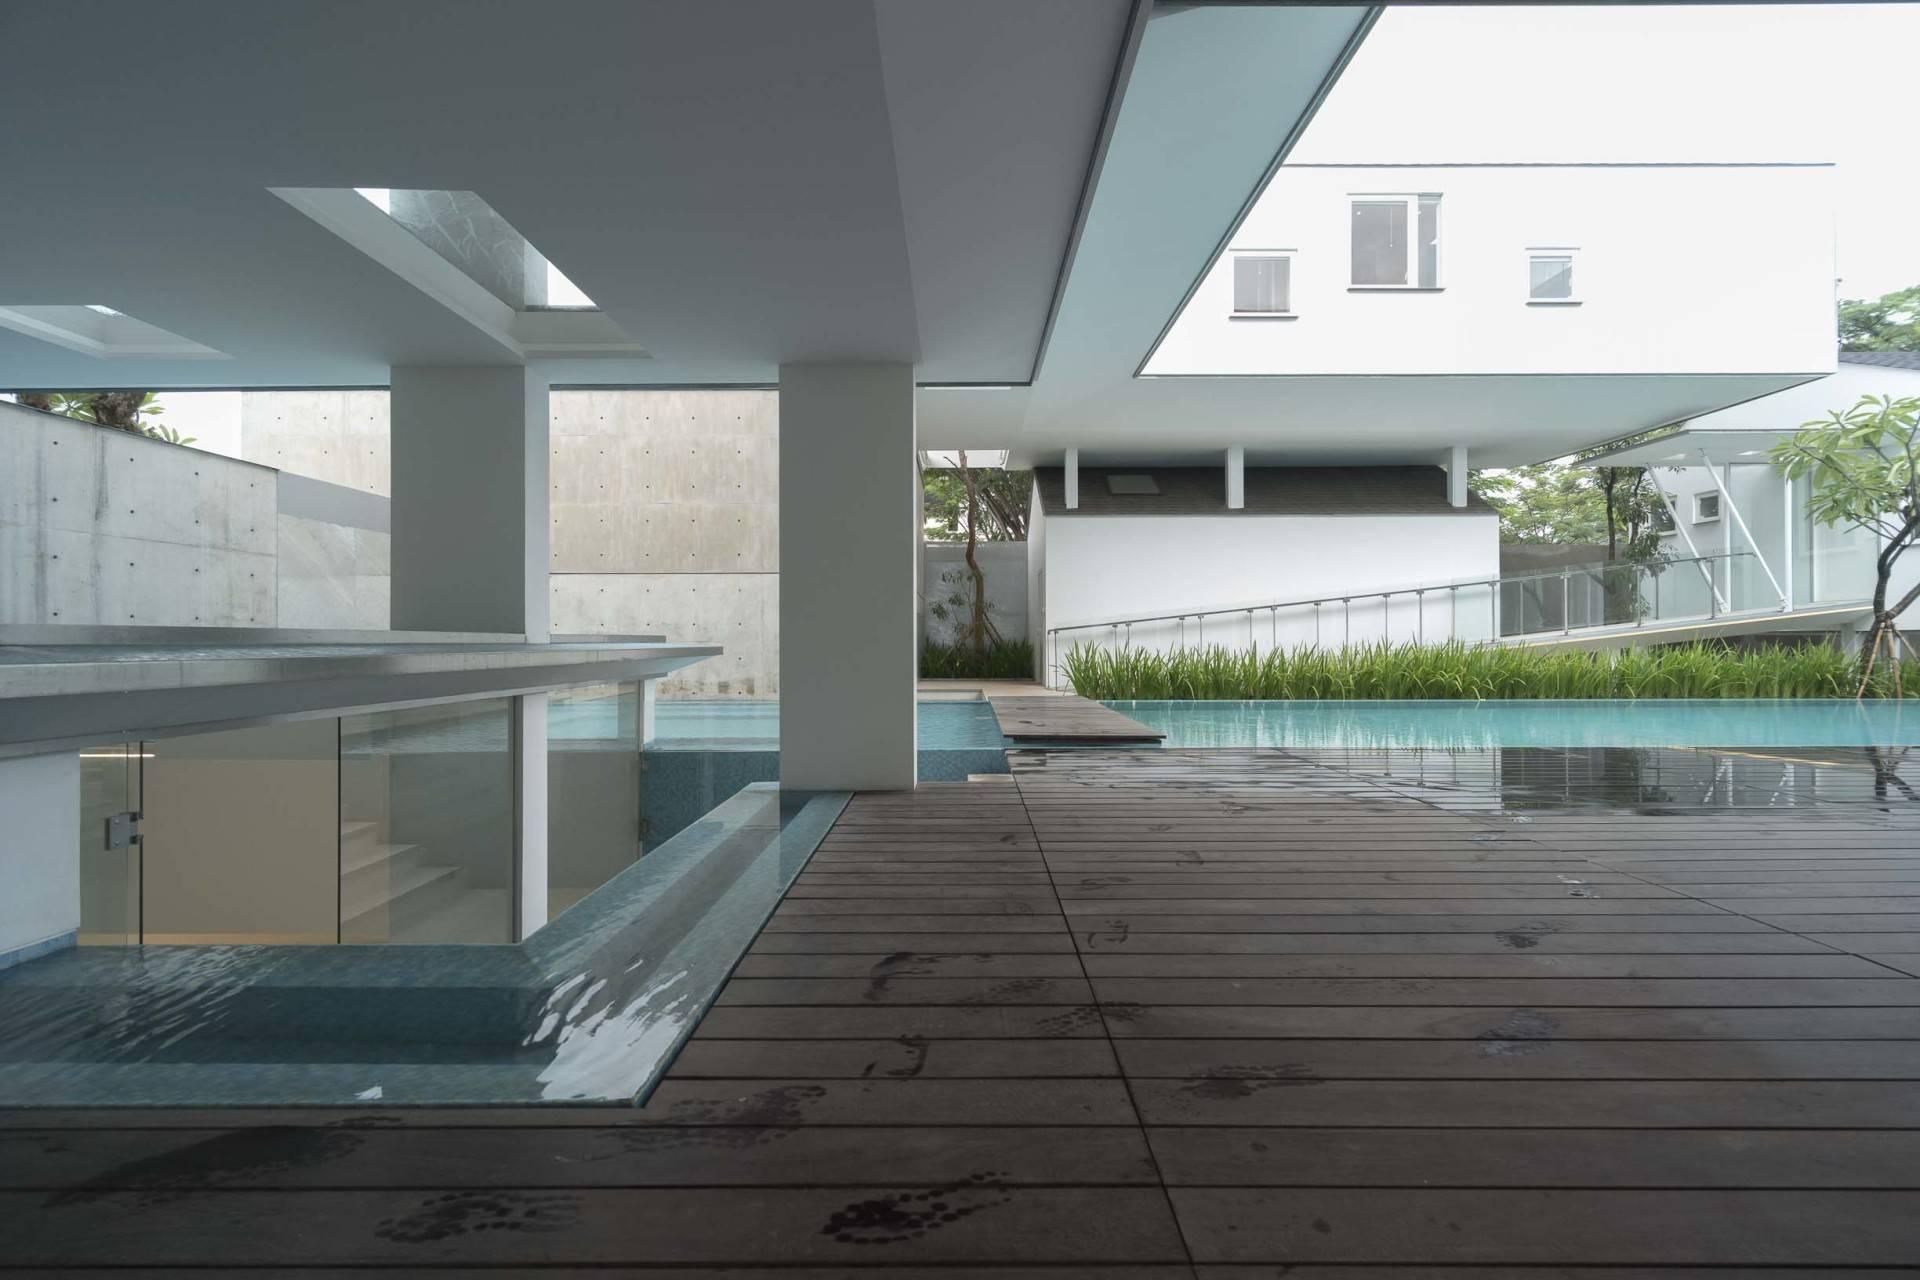 Antony Liu + Ferry Ridwan / Studio Tonton Is House Tangerang Tangerang Swimming Pool Area Modern  8171